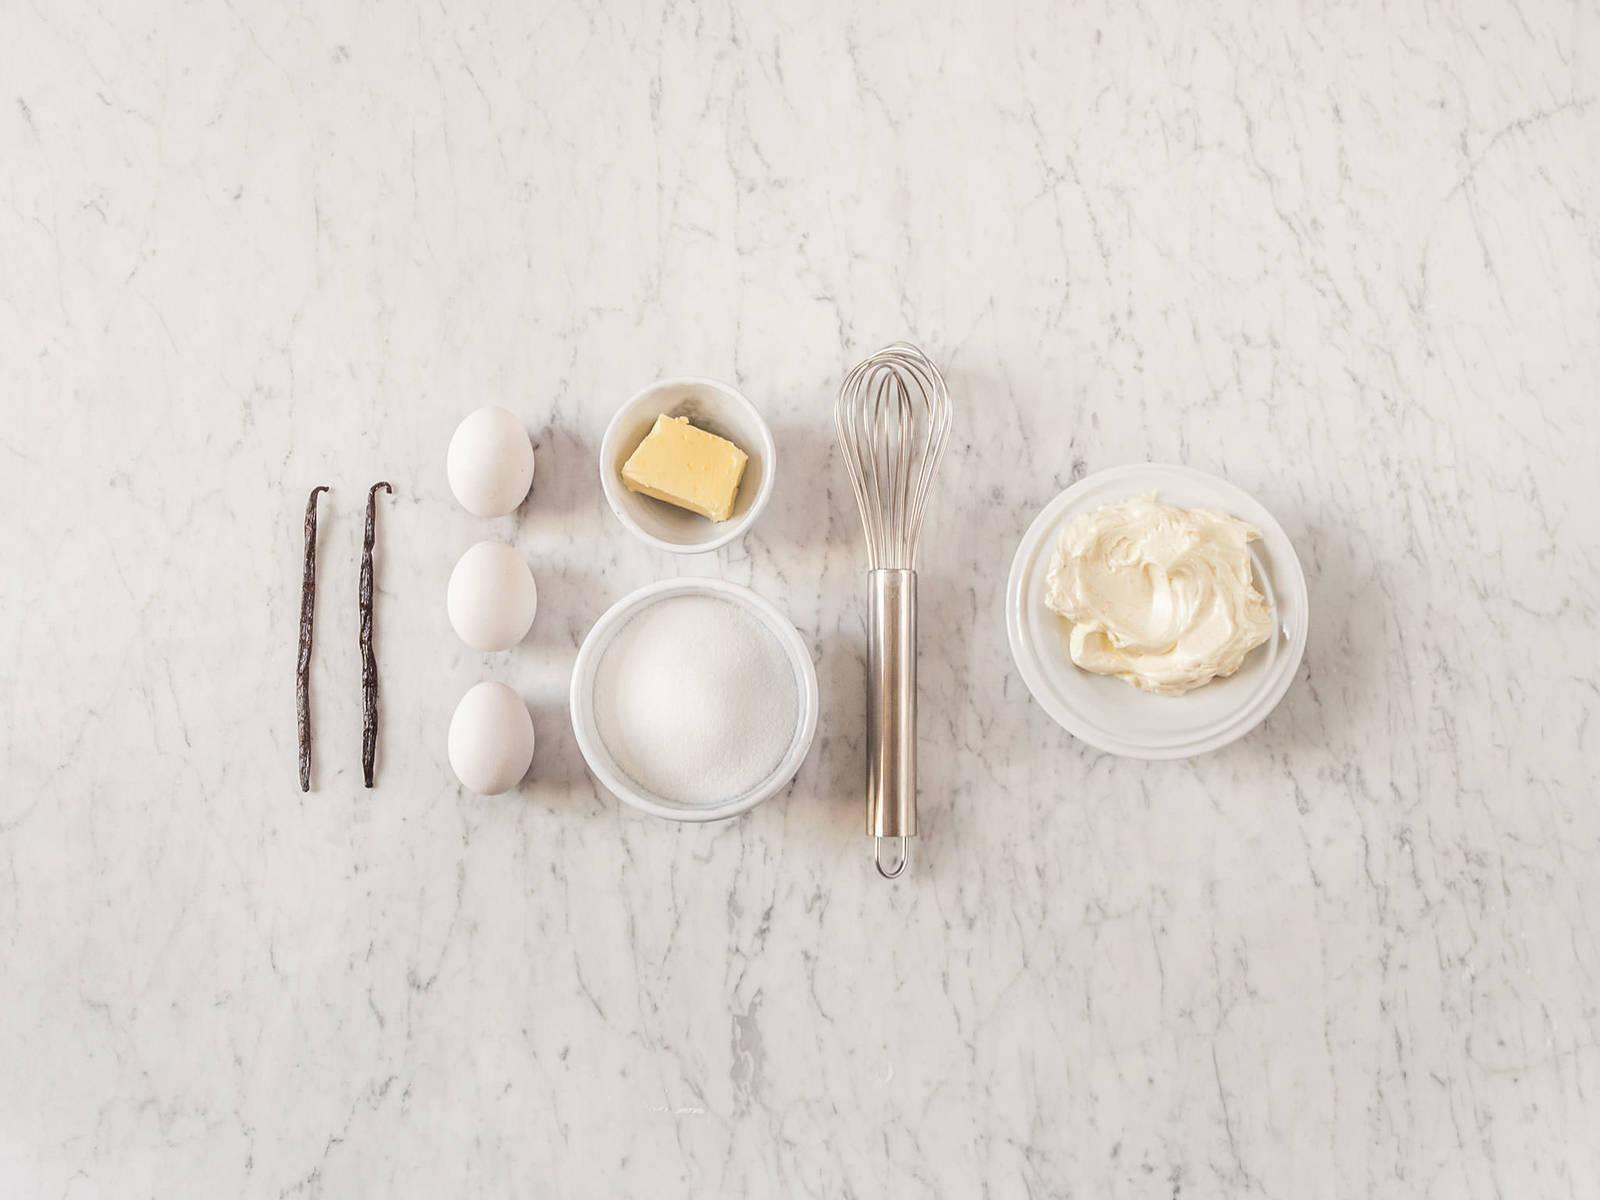 Swiss buttercreme